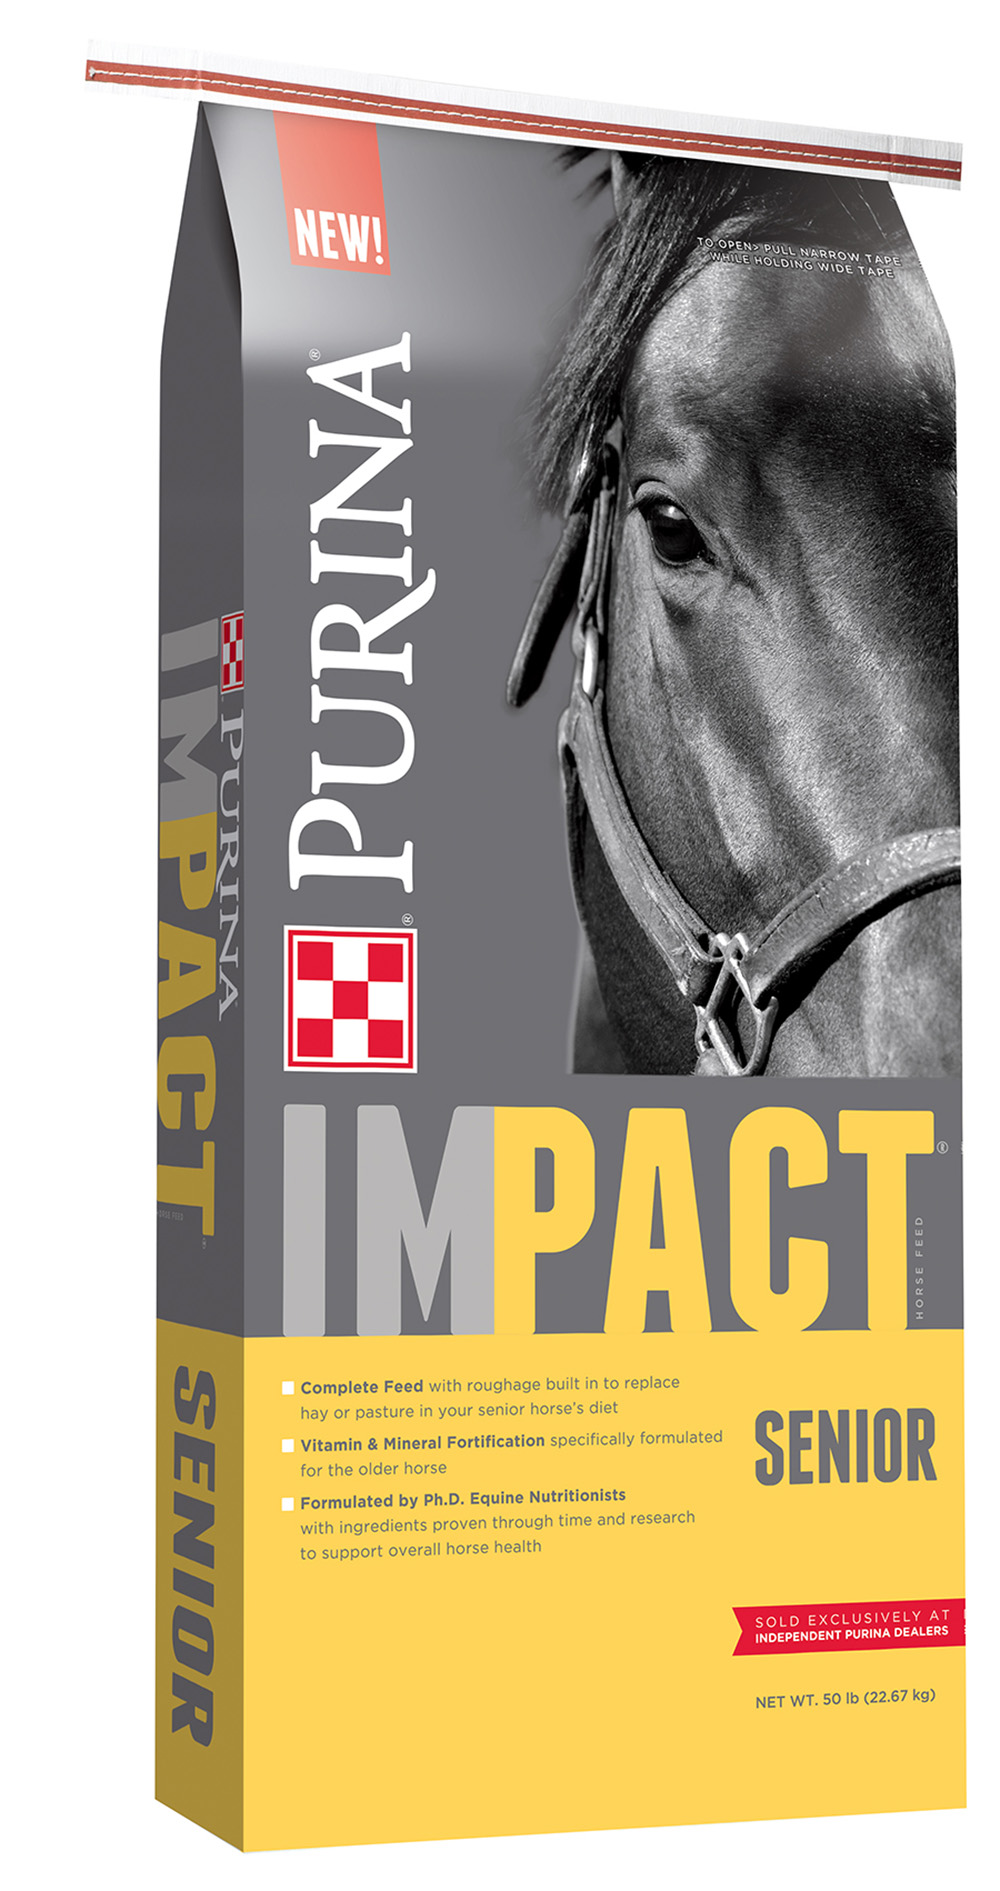 Purina Impact Senior Wet 50 Lb